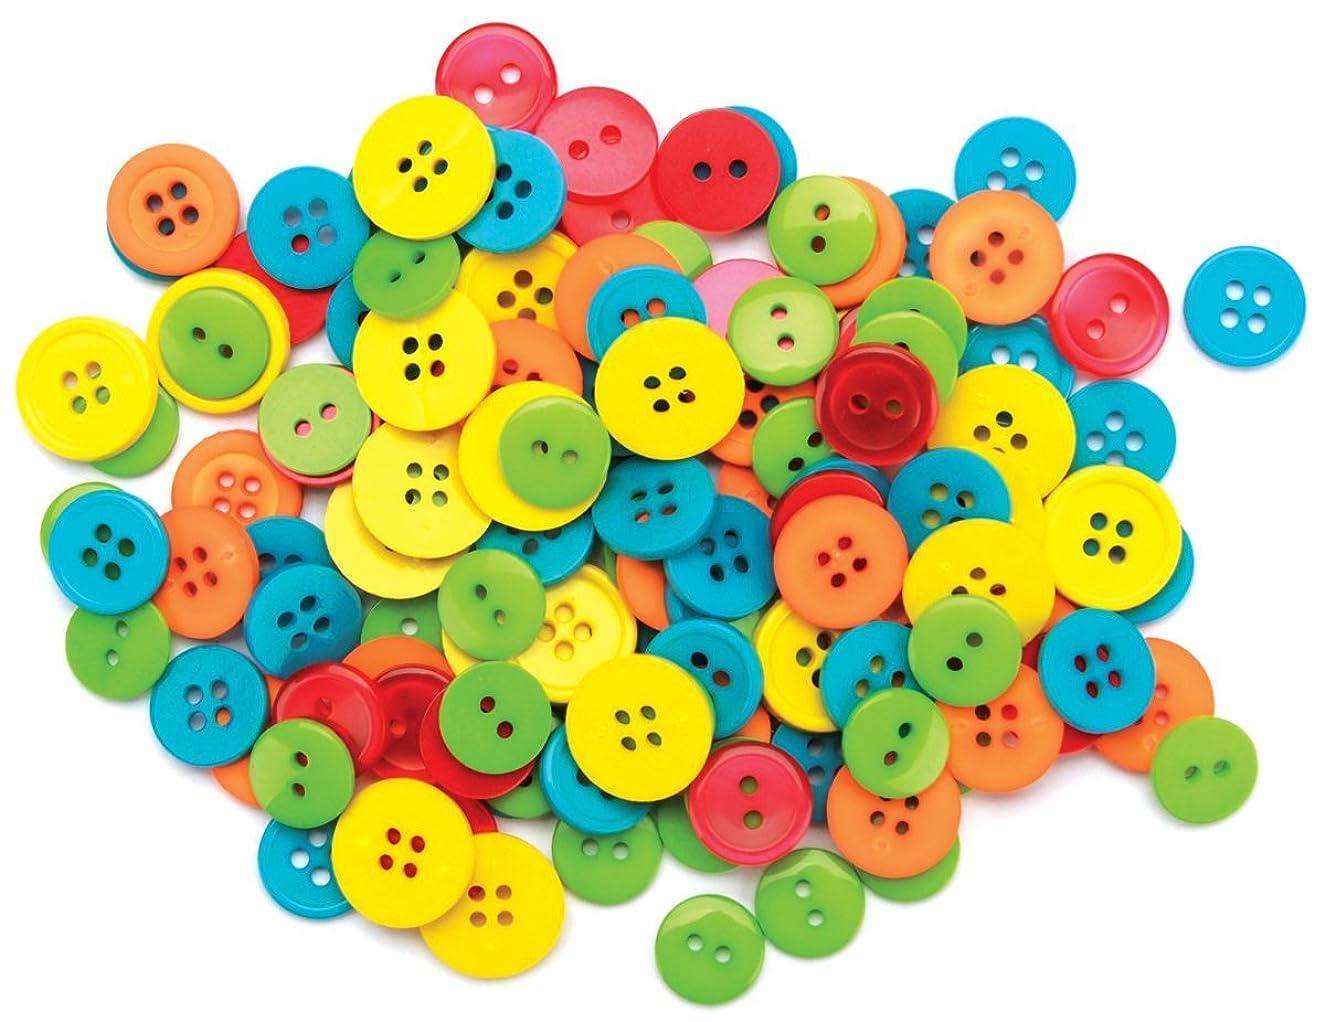 Blumenthal Lansing Basic Buttons Assorted Sizes, 130/Pkg, Citrus